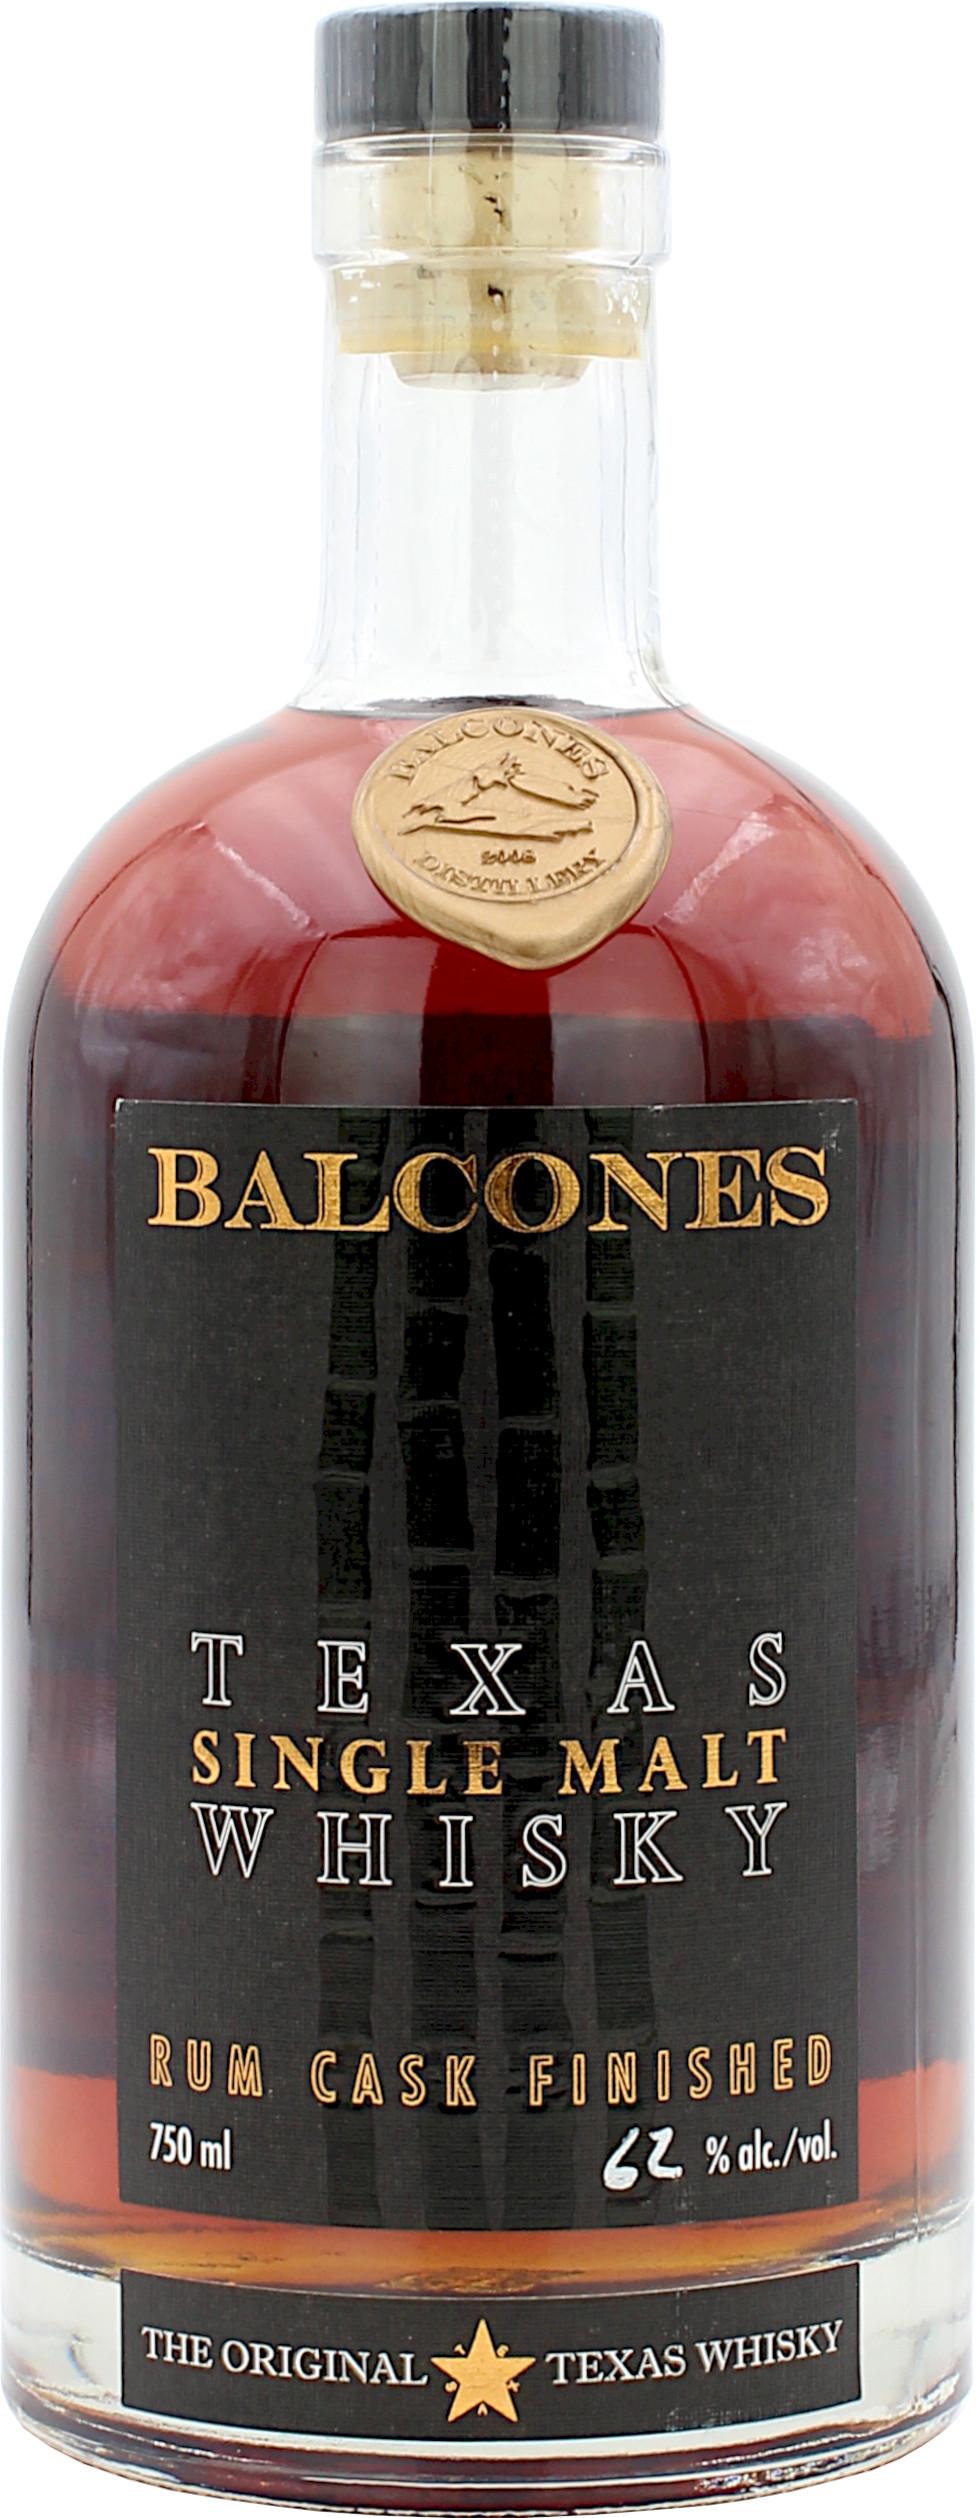 Balcones Texas Single Malt Rum Cask Finish Limited Edition 2020 62.0% 0,7l